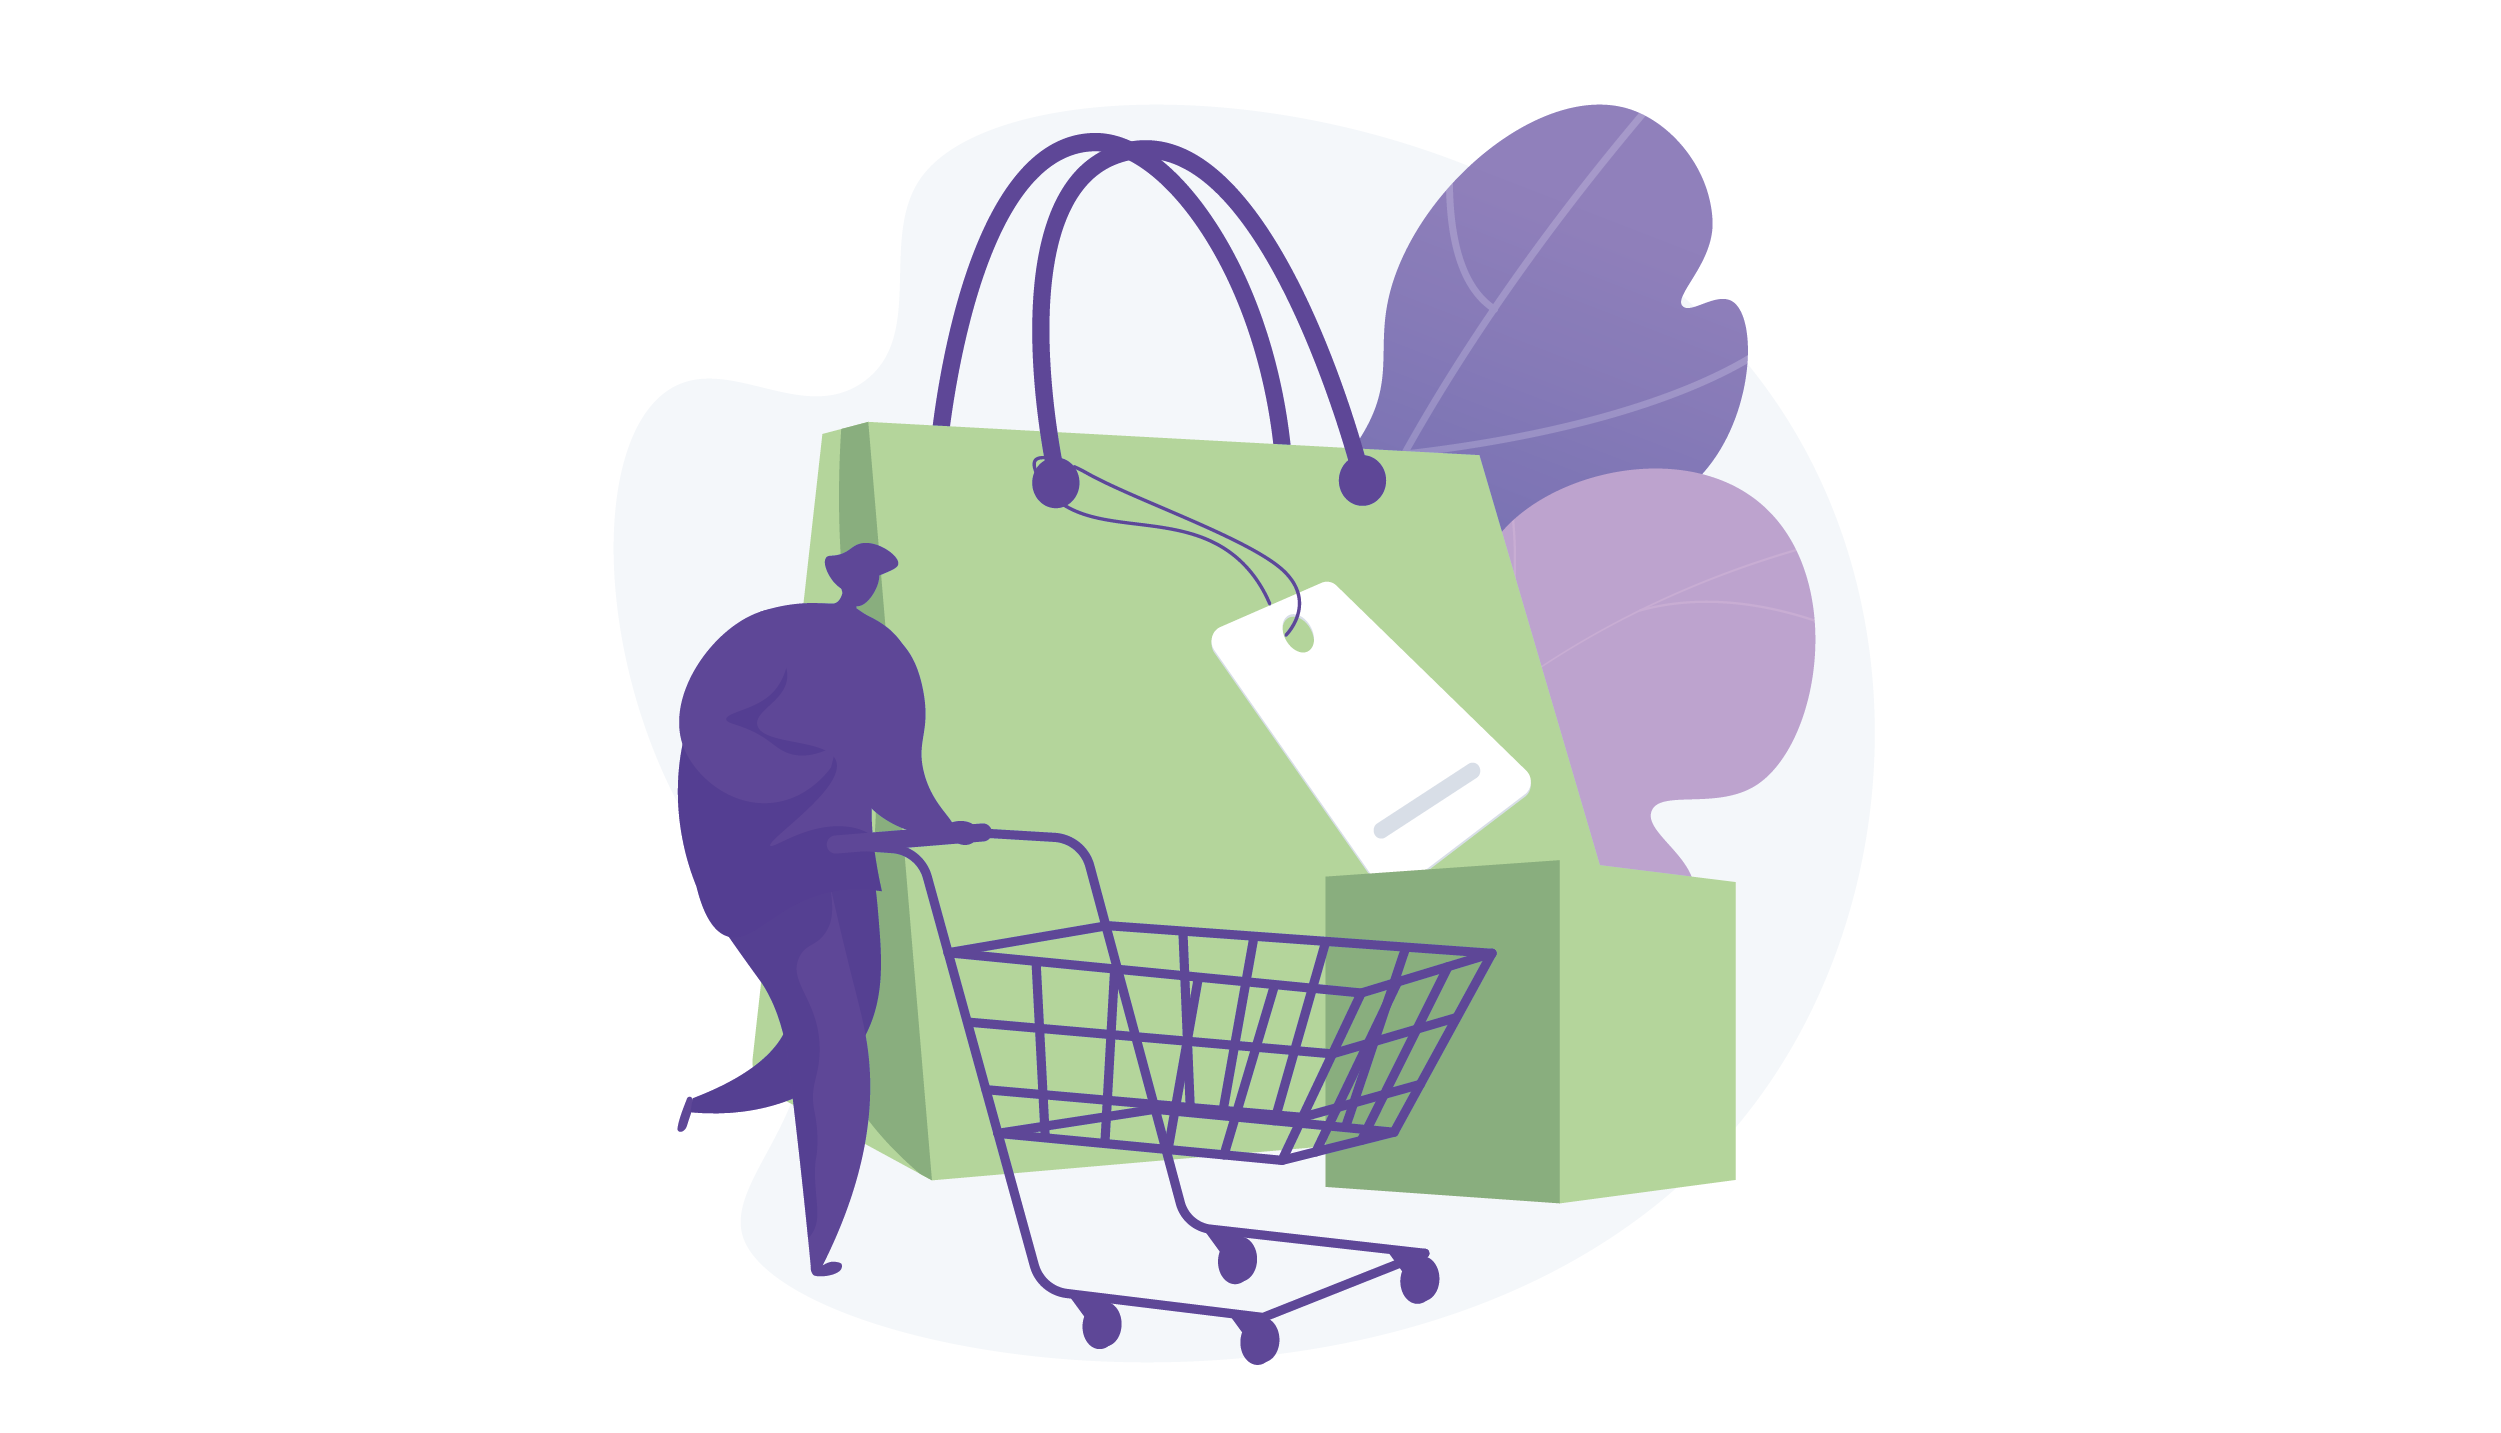 Требования к упаковке товара на маркетплейсах «СберМегаМаркет», Wildberries, Ozon, Kaspi, «Яндекс.Маркет» и AliExpress